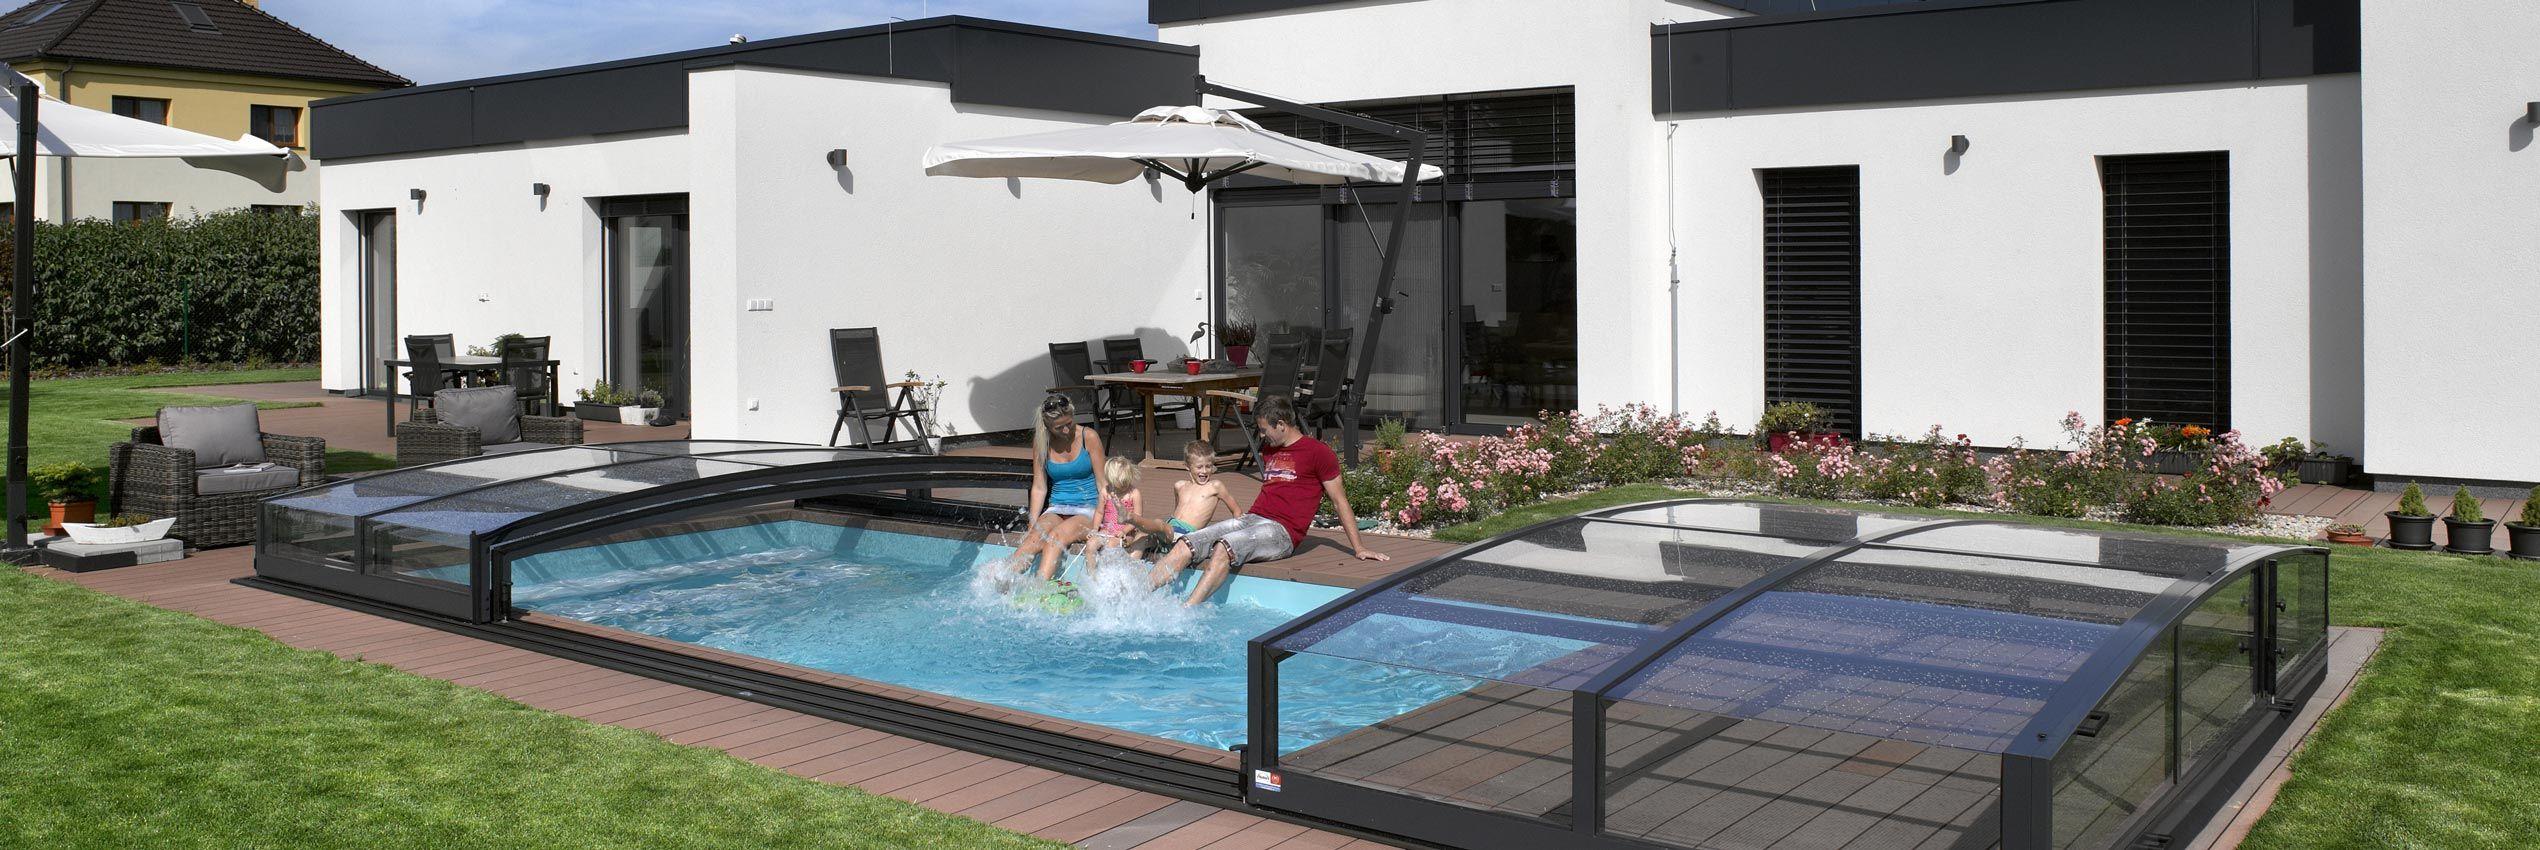 Abri de piscine Viva semi ouvert